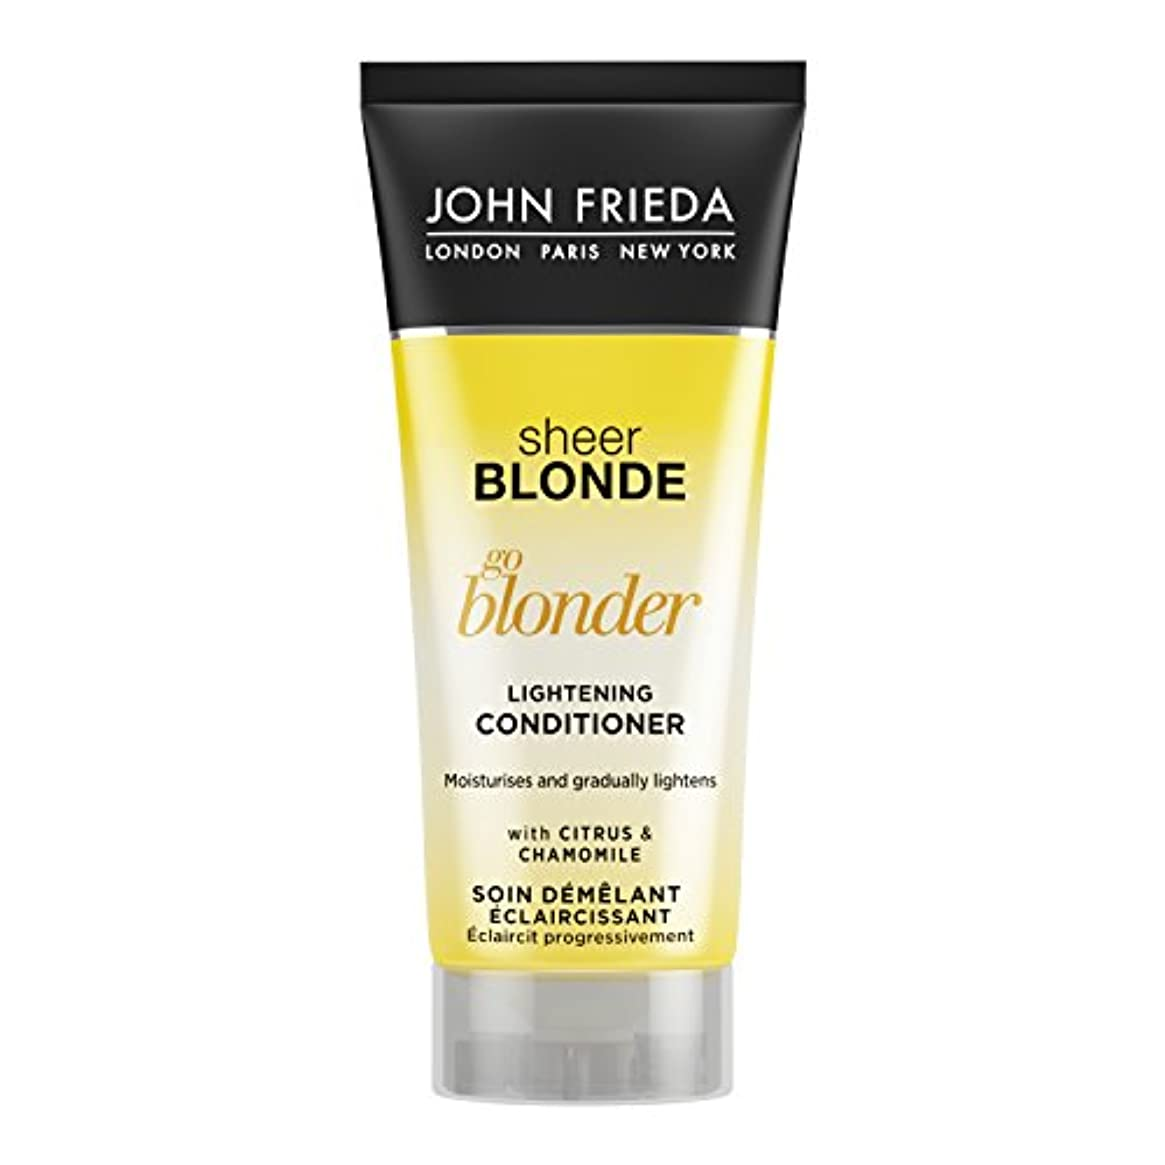 John Frieda Sheer Blonde Go Blonder Lightening Conditioner Travel Size 50ml